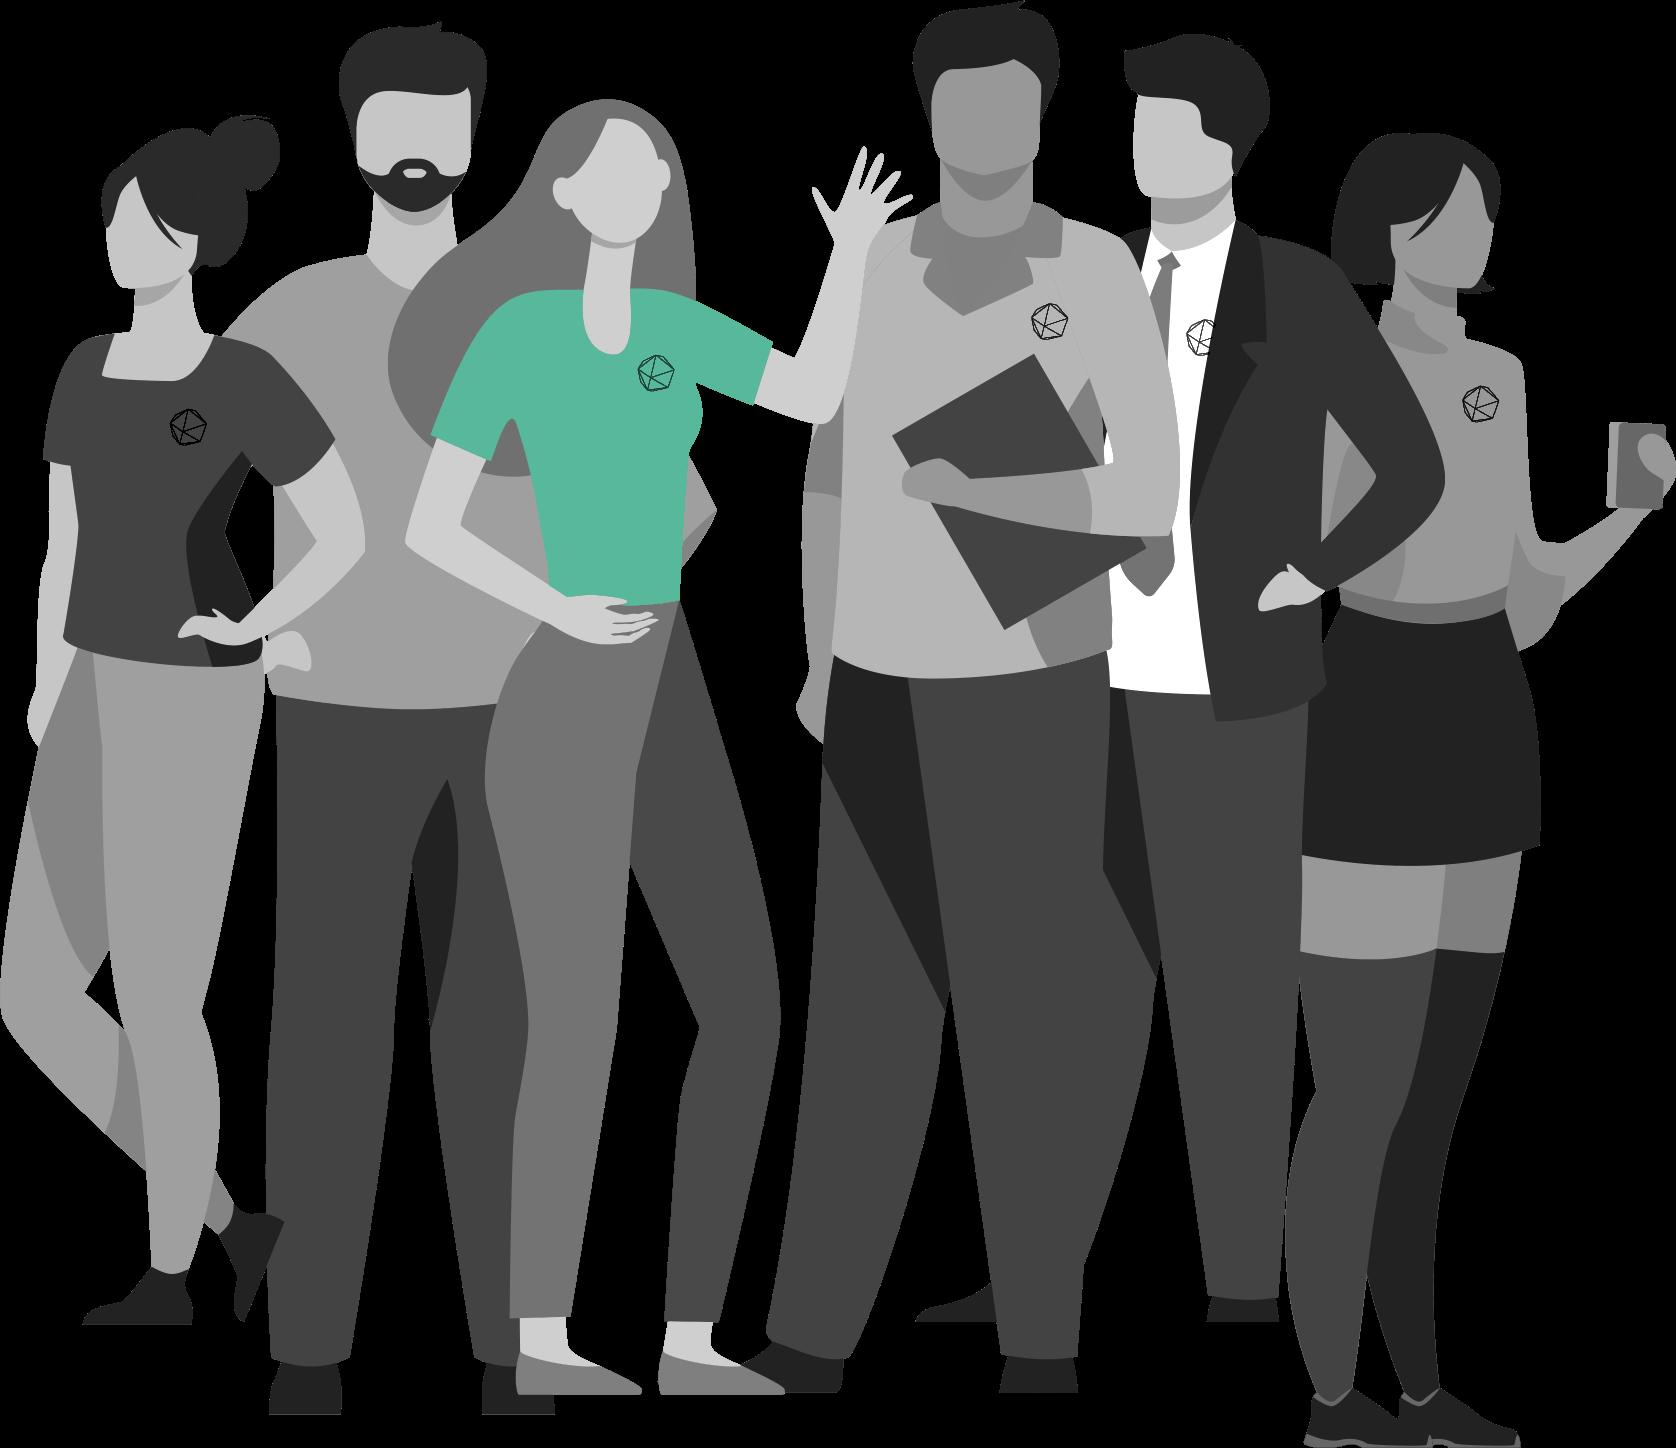 visuel team carriere fashion data job